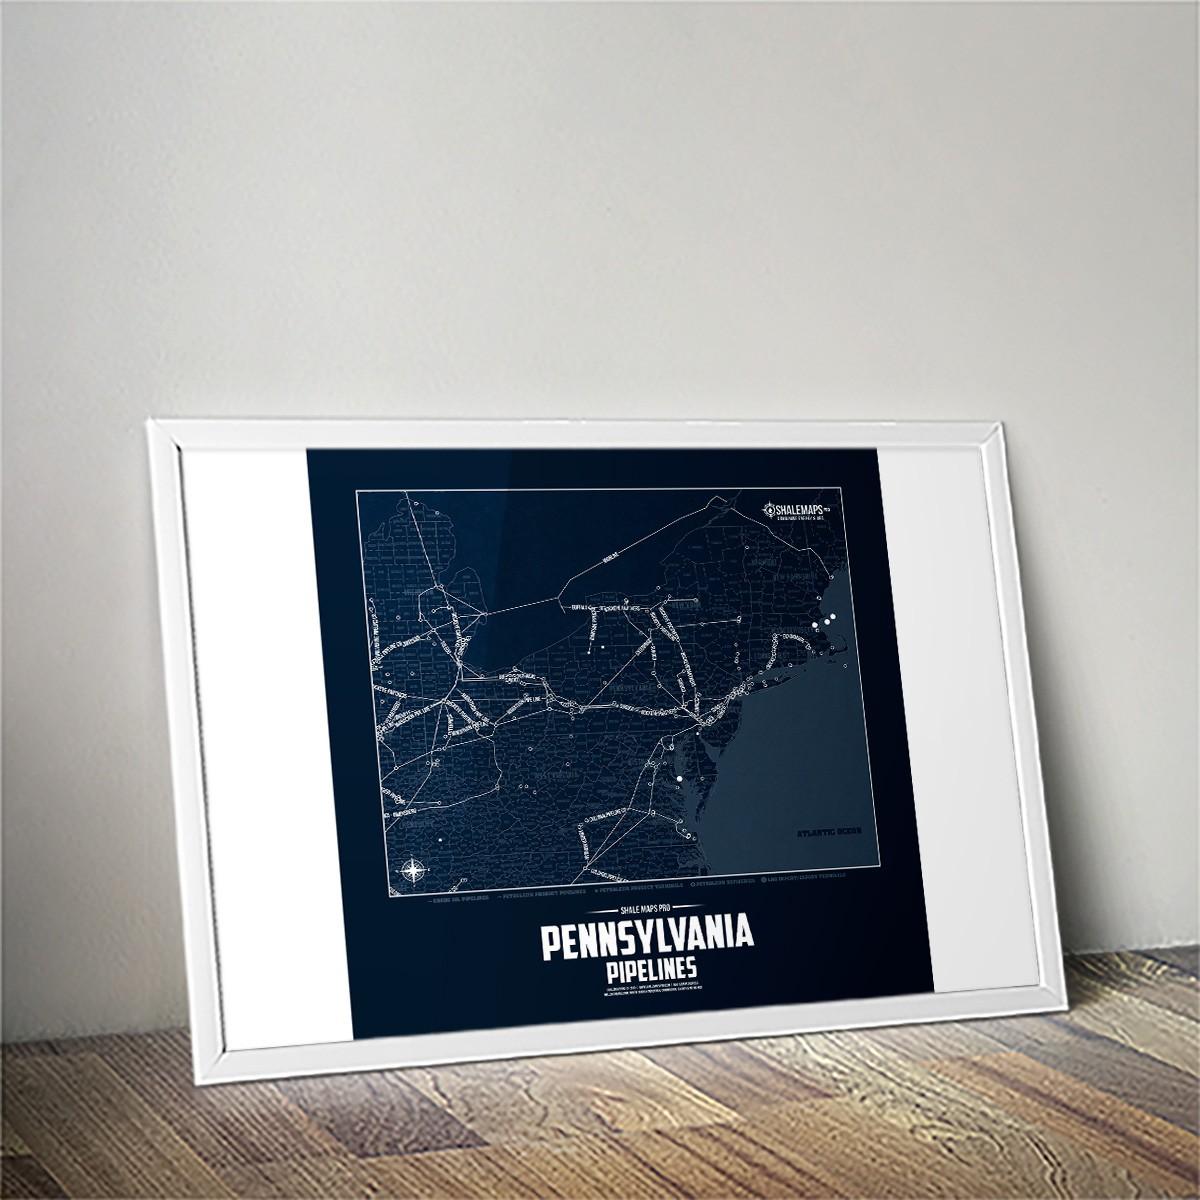 Pennsylvania Oil & Gas Pipelines Blueprint